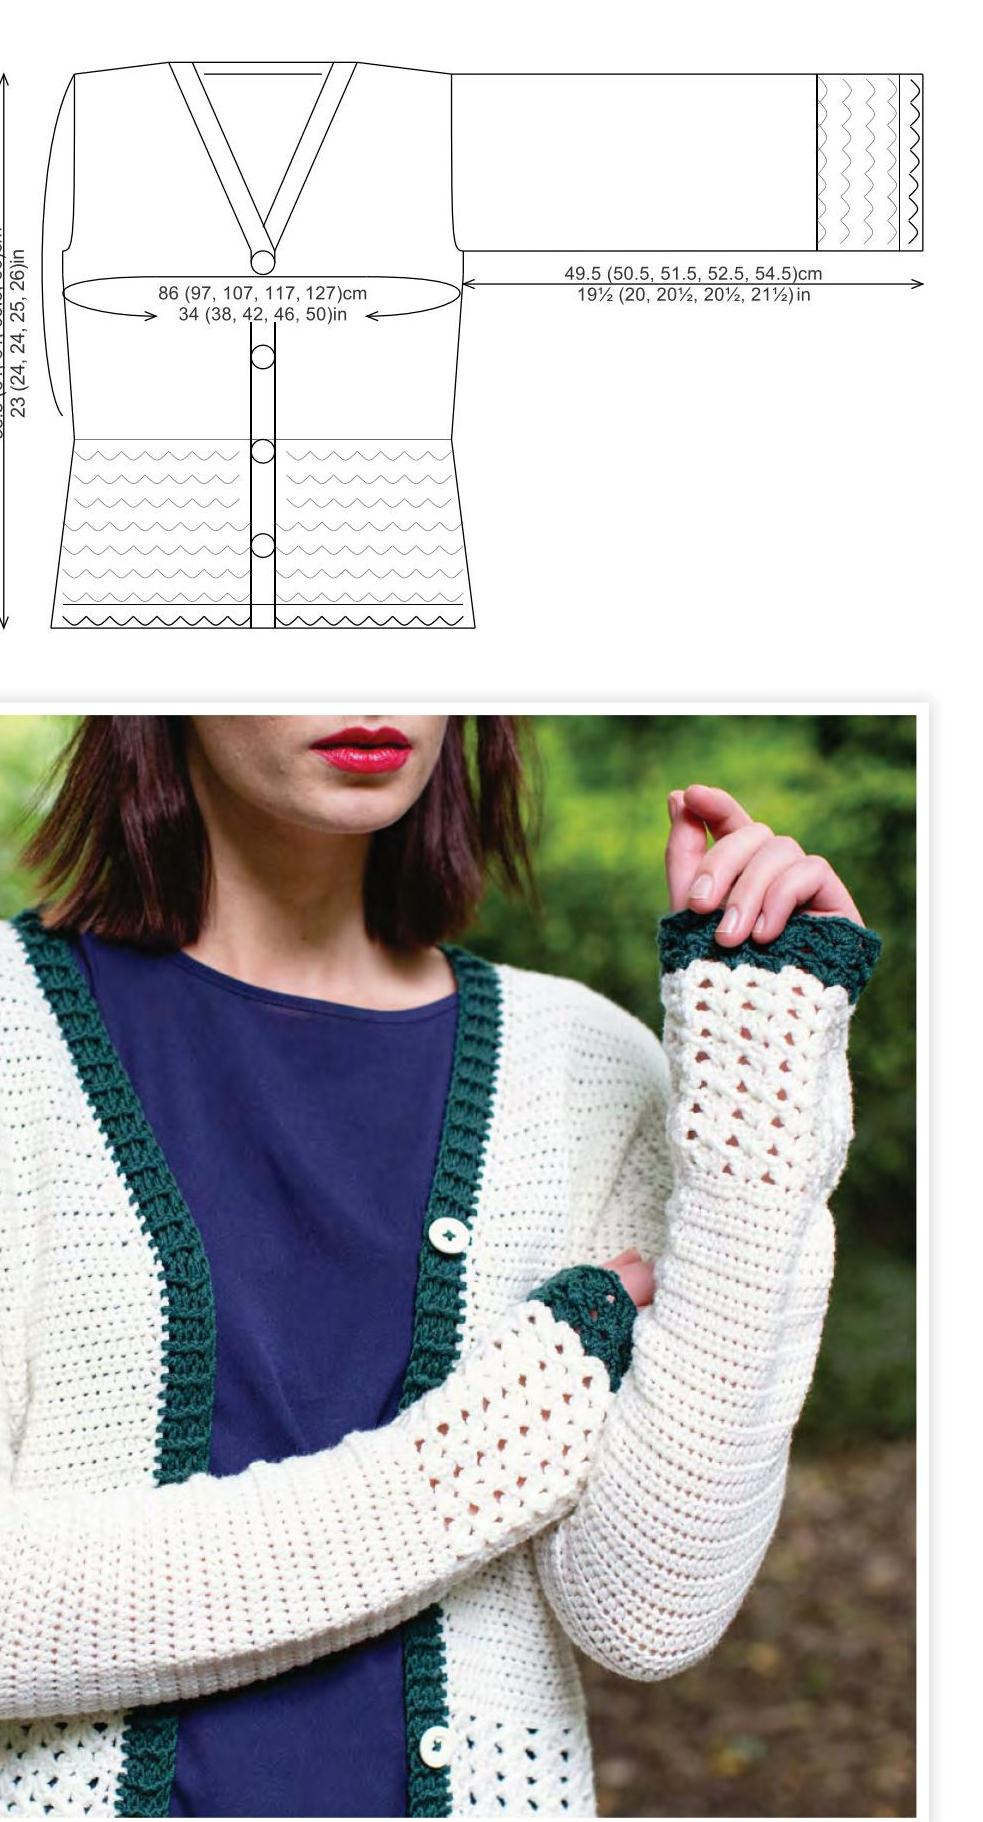 1592_Inside Crochet 69_018 (2)